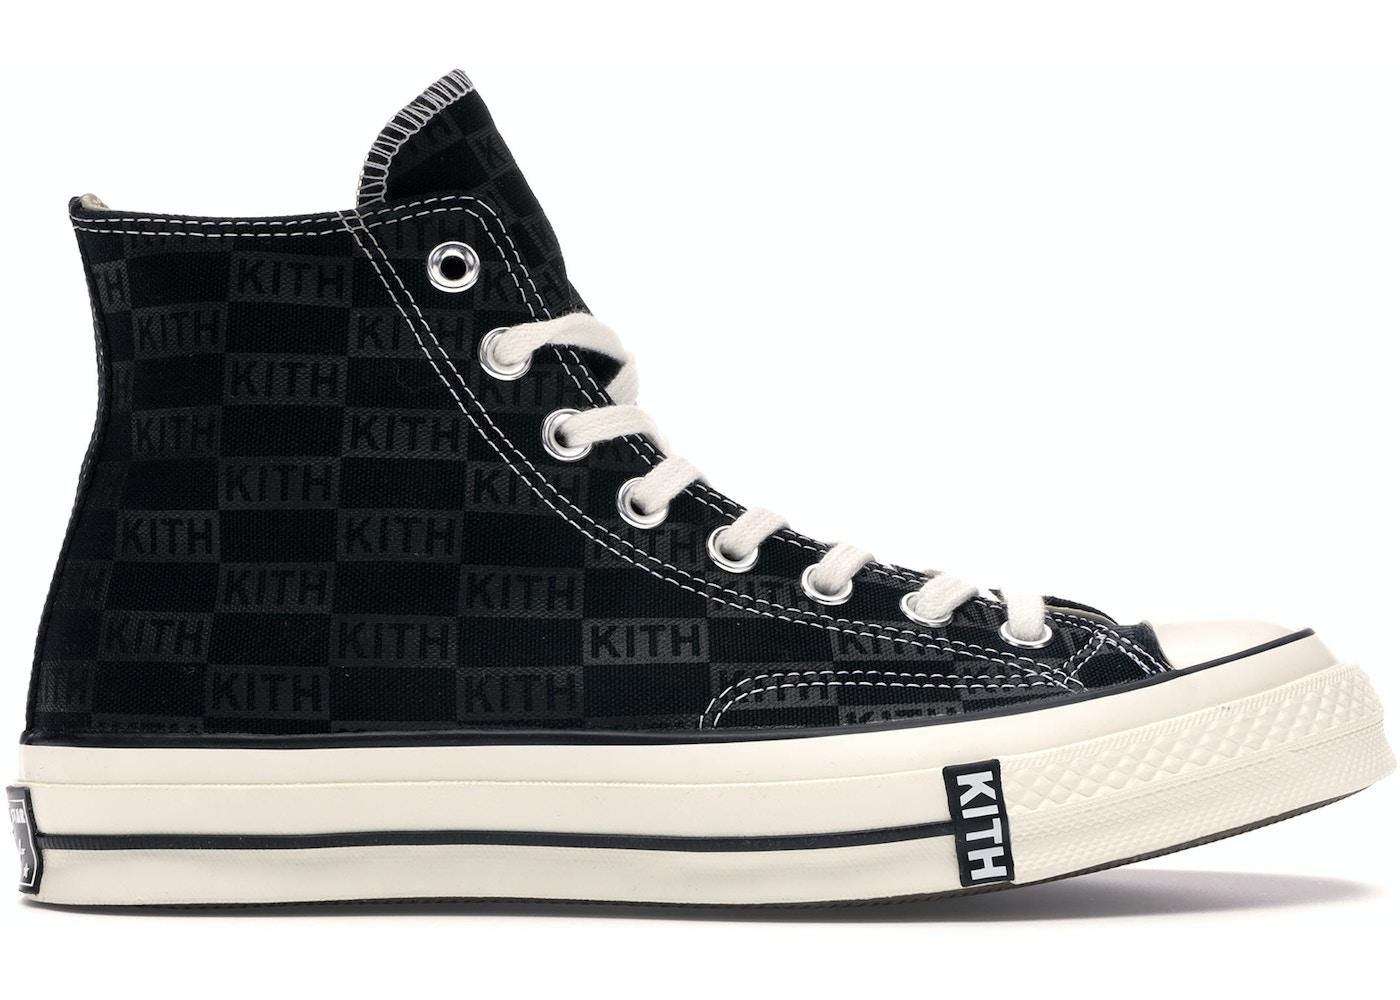 e76ab8fac9d Converse Chuck Taylor All-Star 70s Hi Kith Classics Black